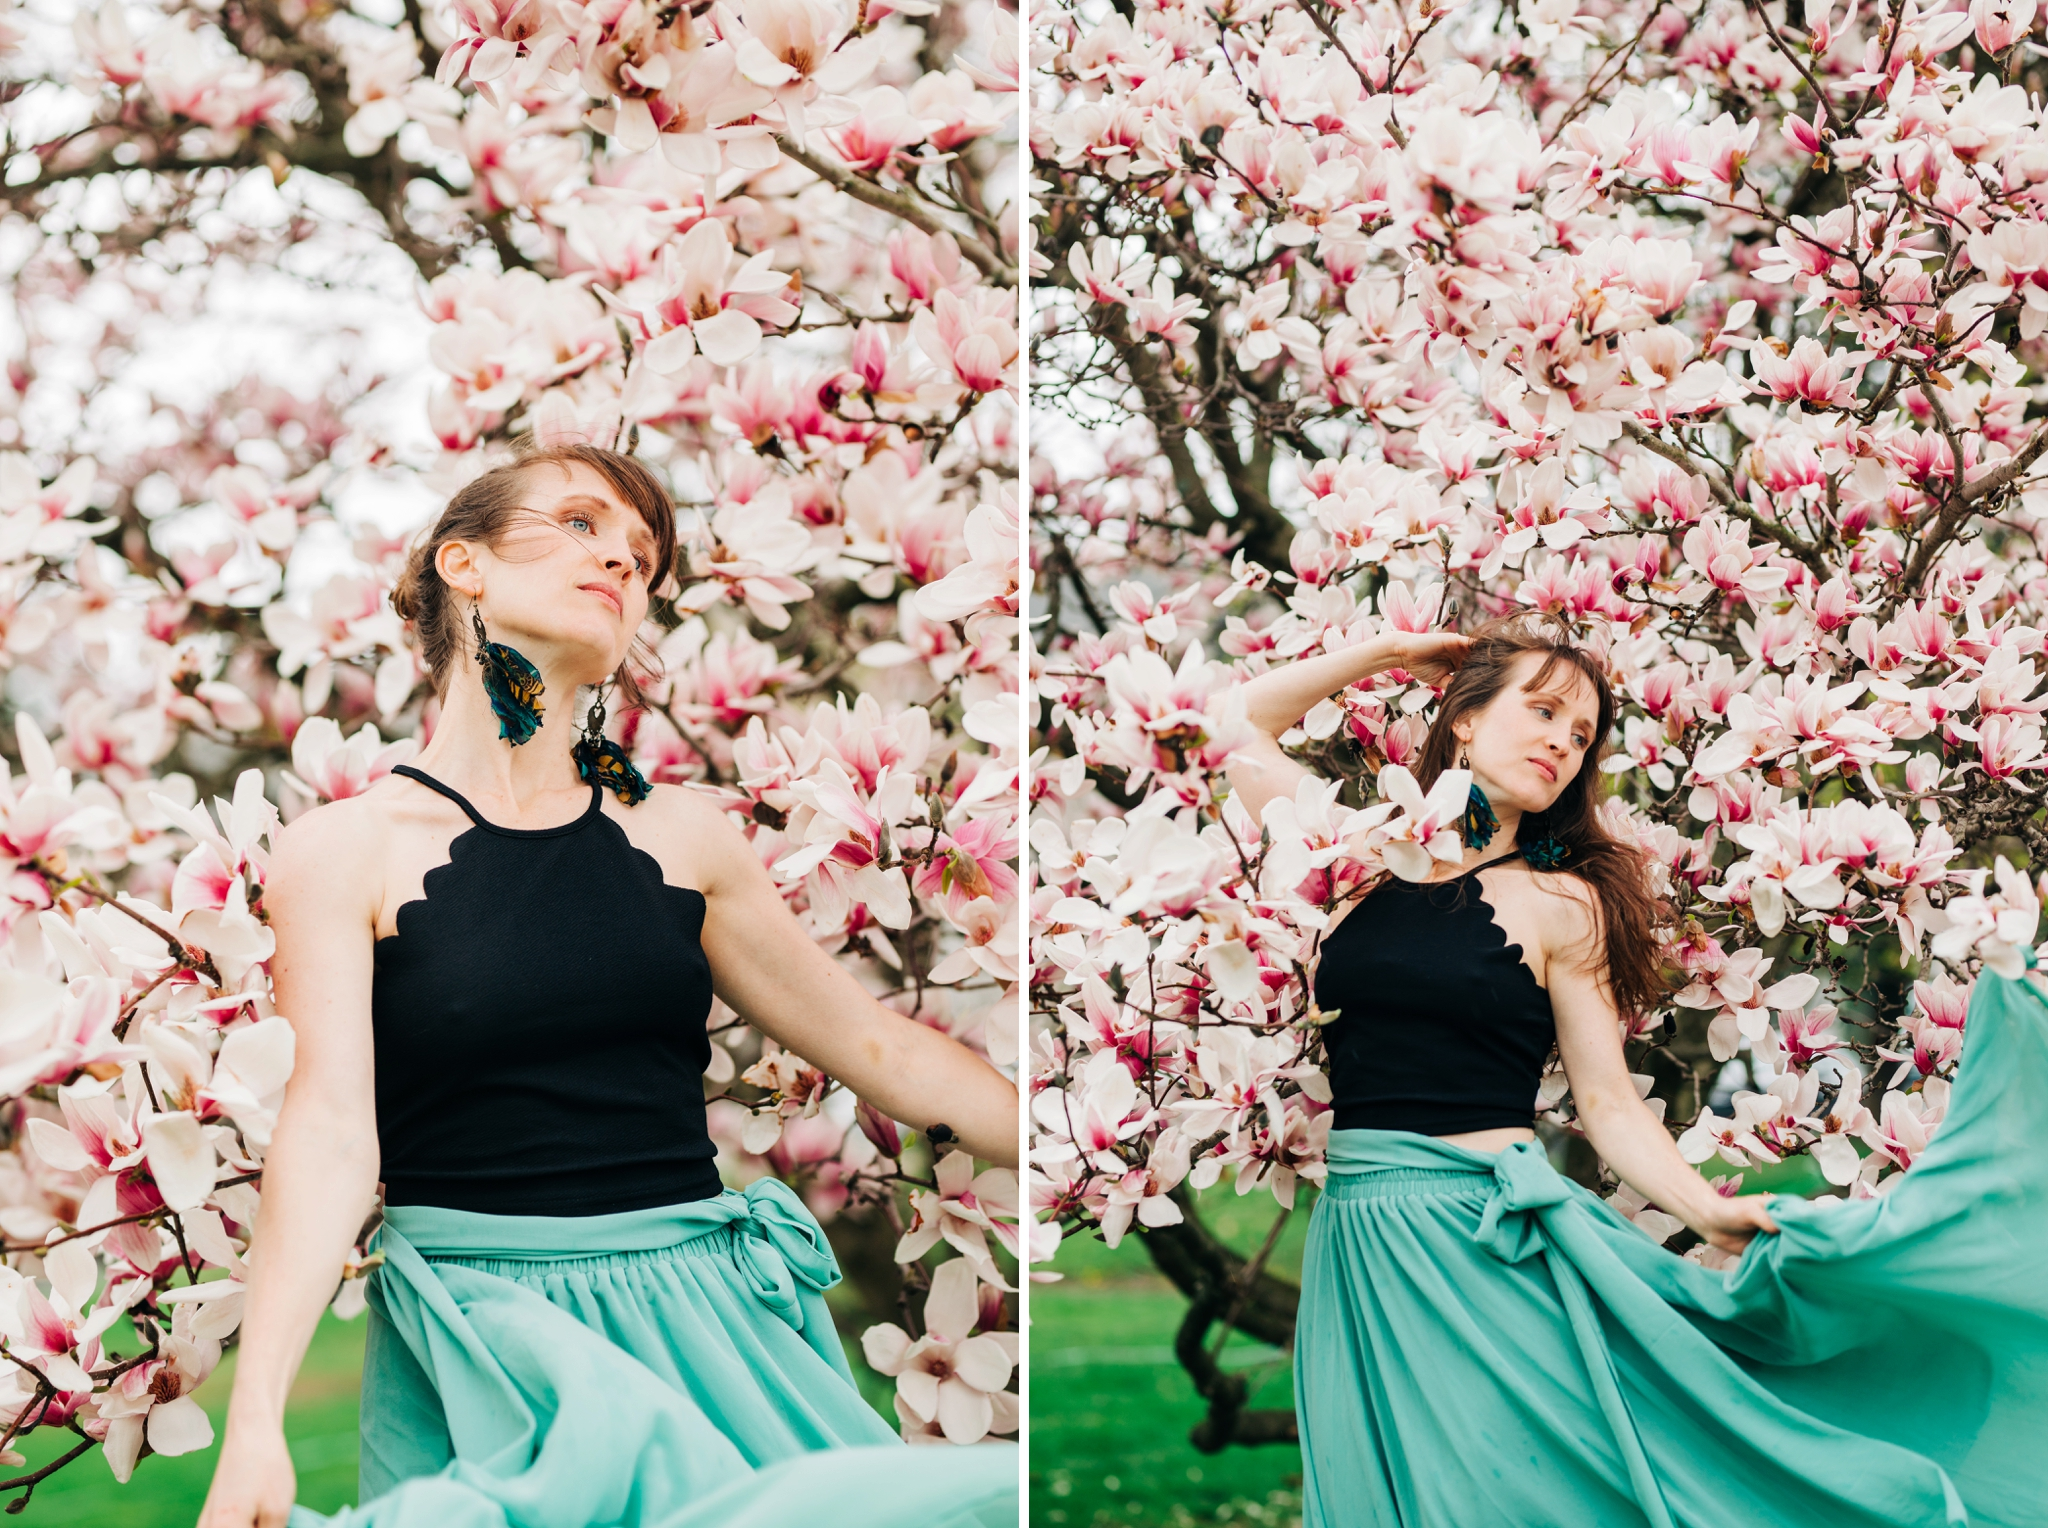 Emily Grace Photography, Lancaster PA Wedding Photographer for Adventurous Couples, Lancaster County Central Park Portrait Session, Magnolia Tree Photo Shoot